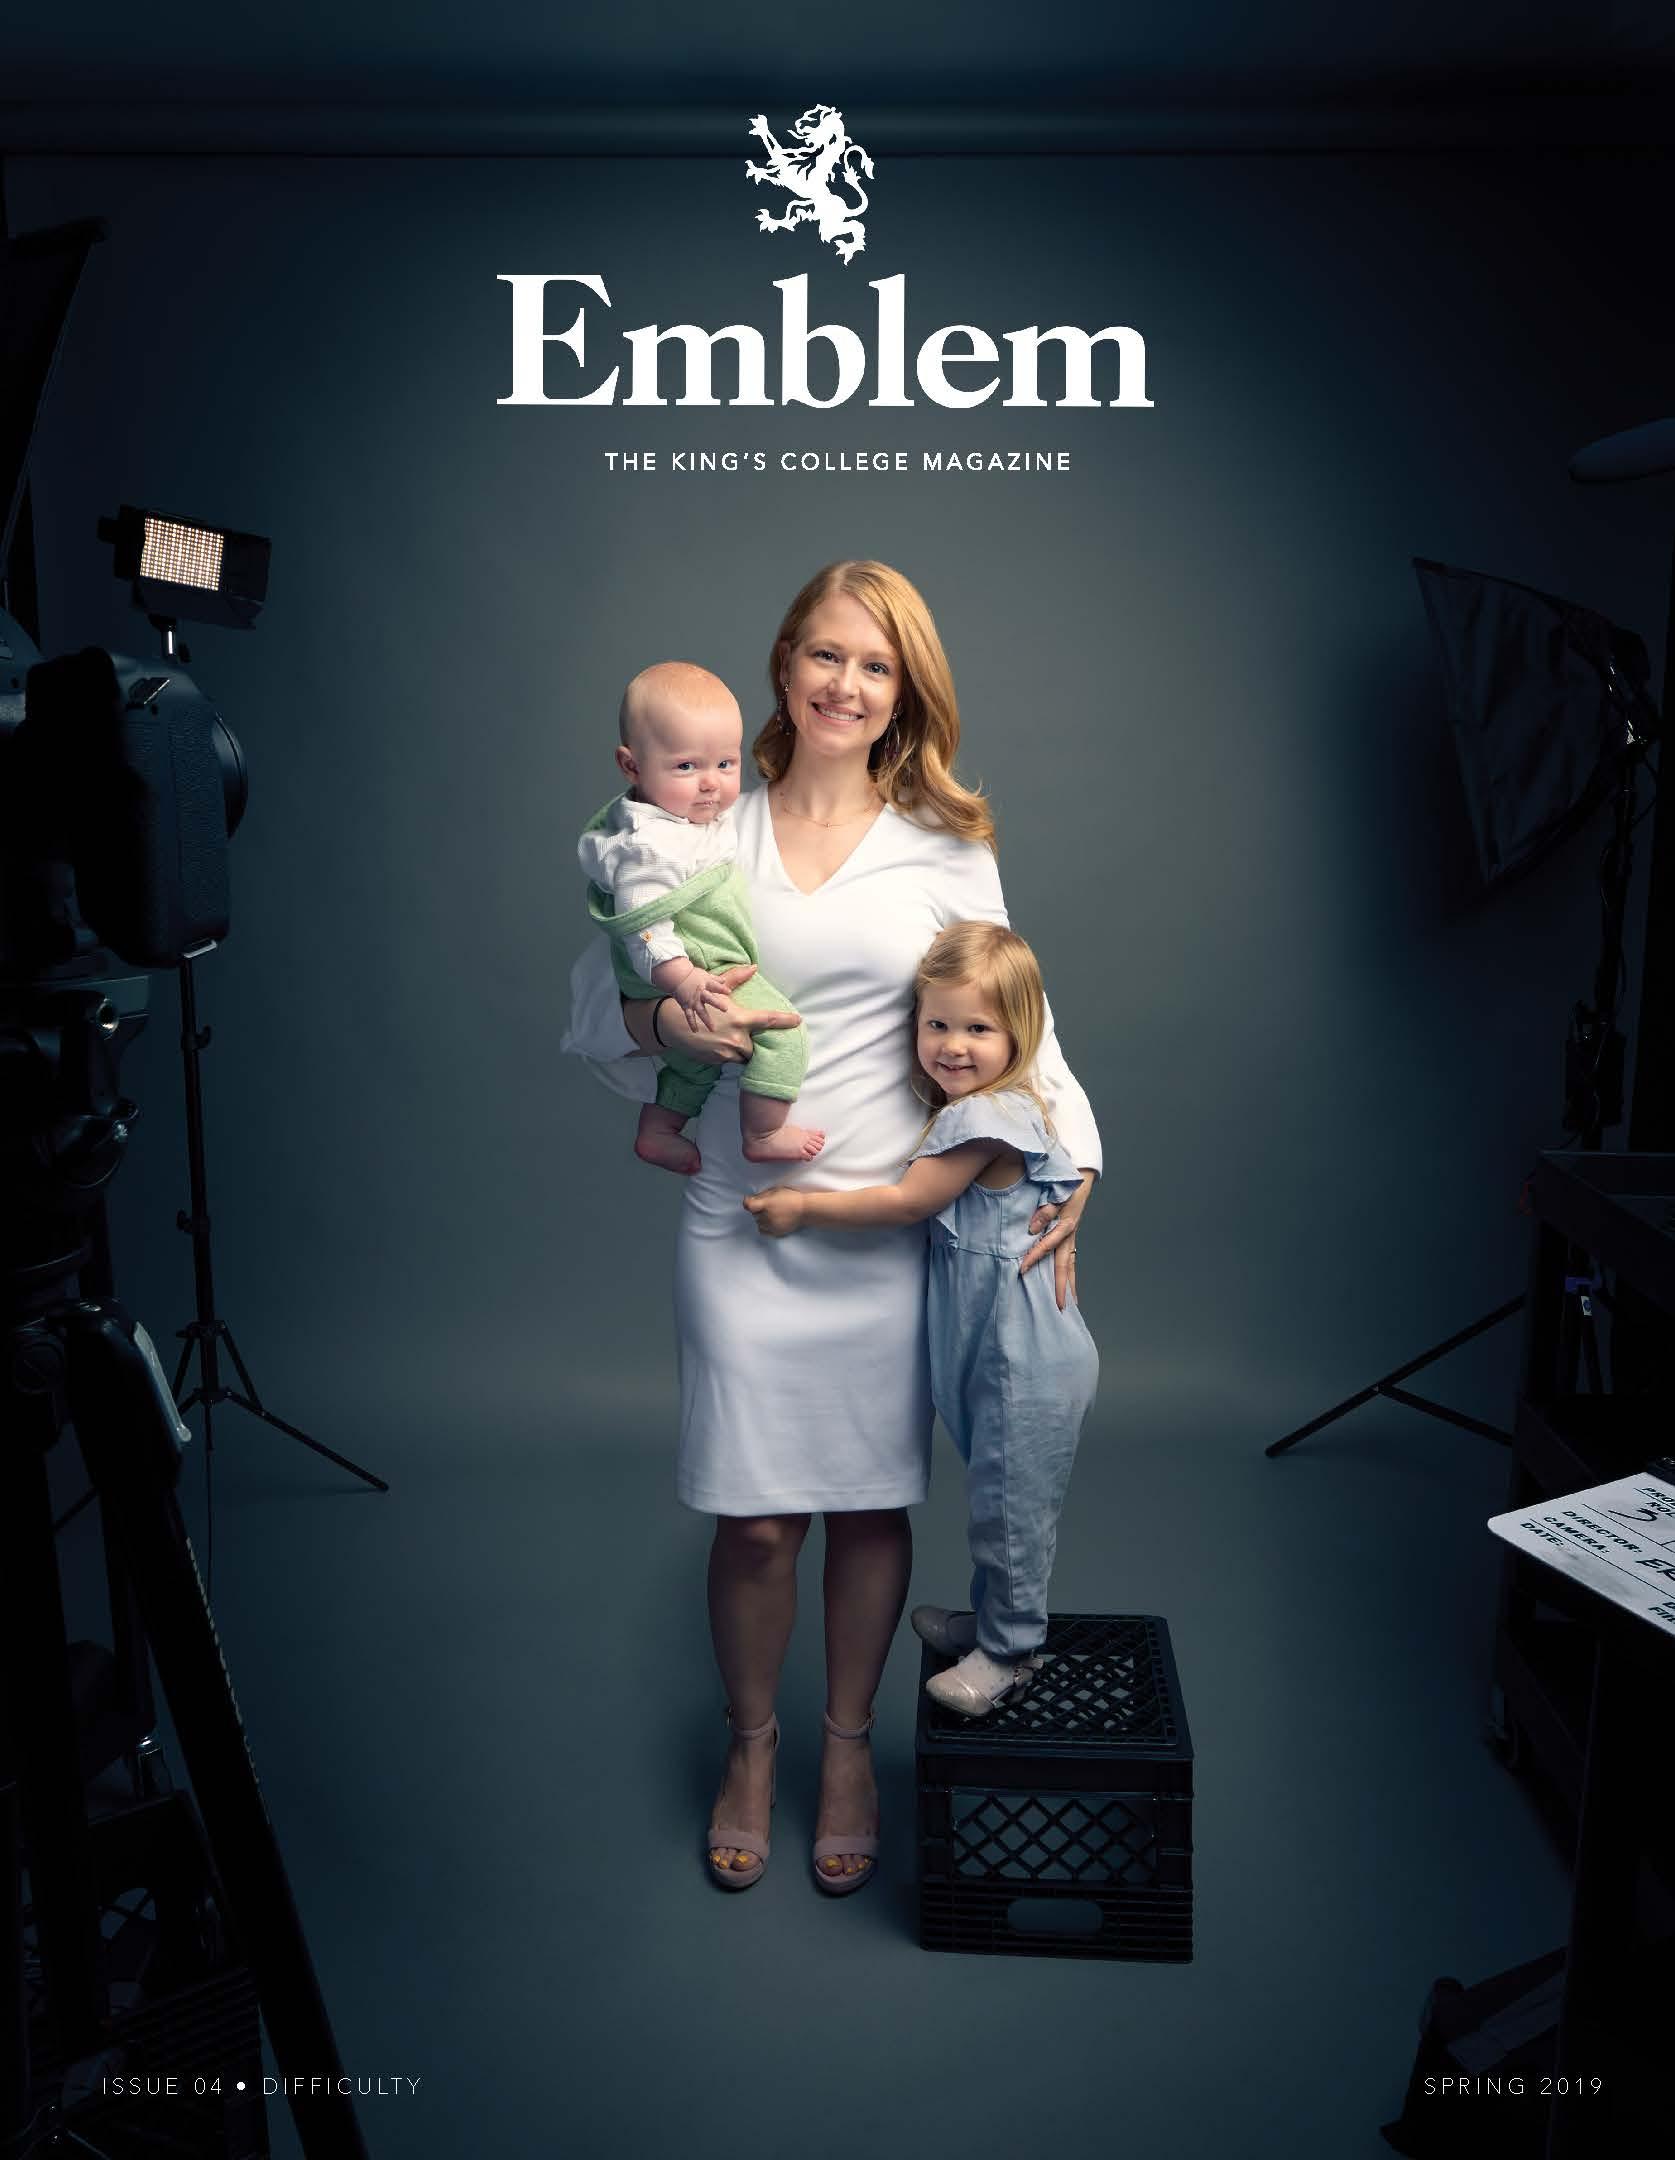 emblem-tkcnyc-magazine-2019_Page_01.jpg